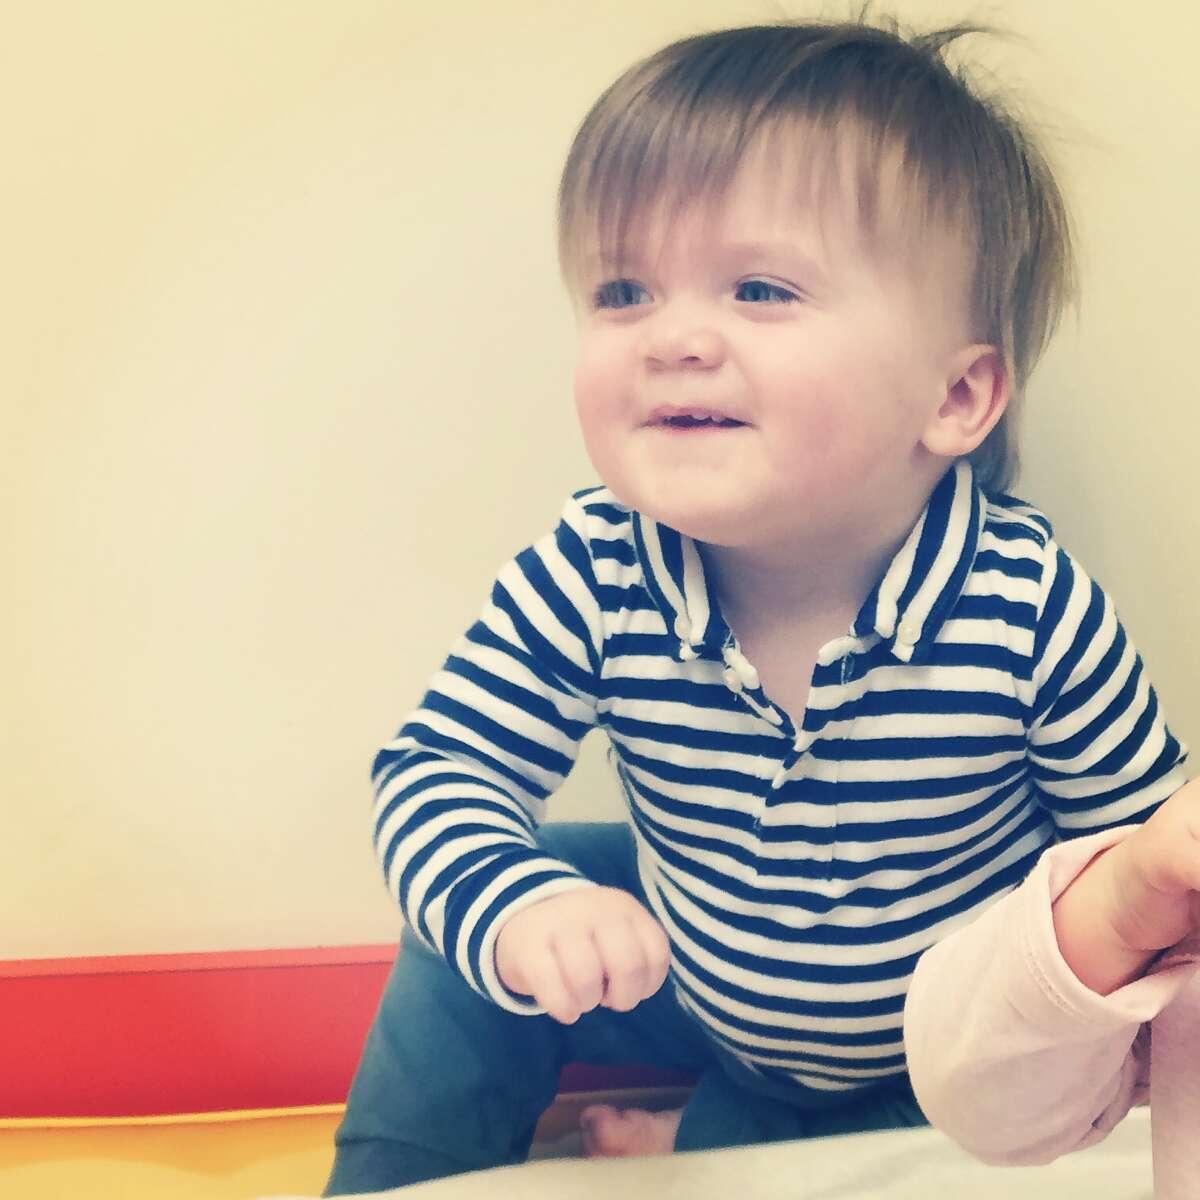 Cole, age 11 months